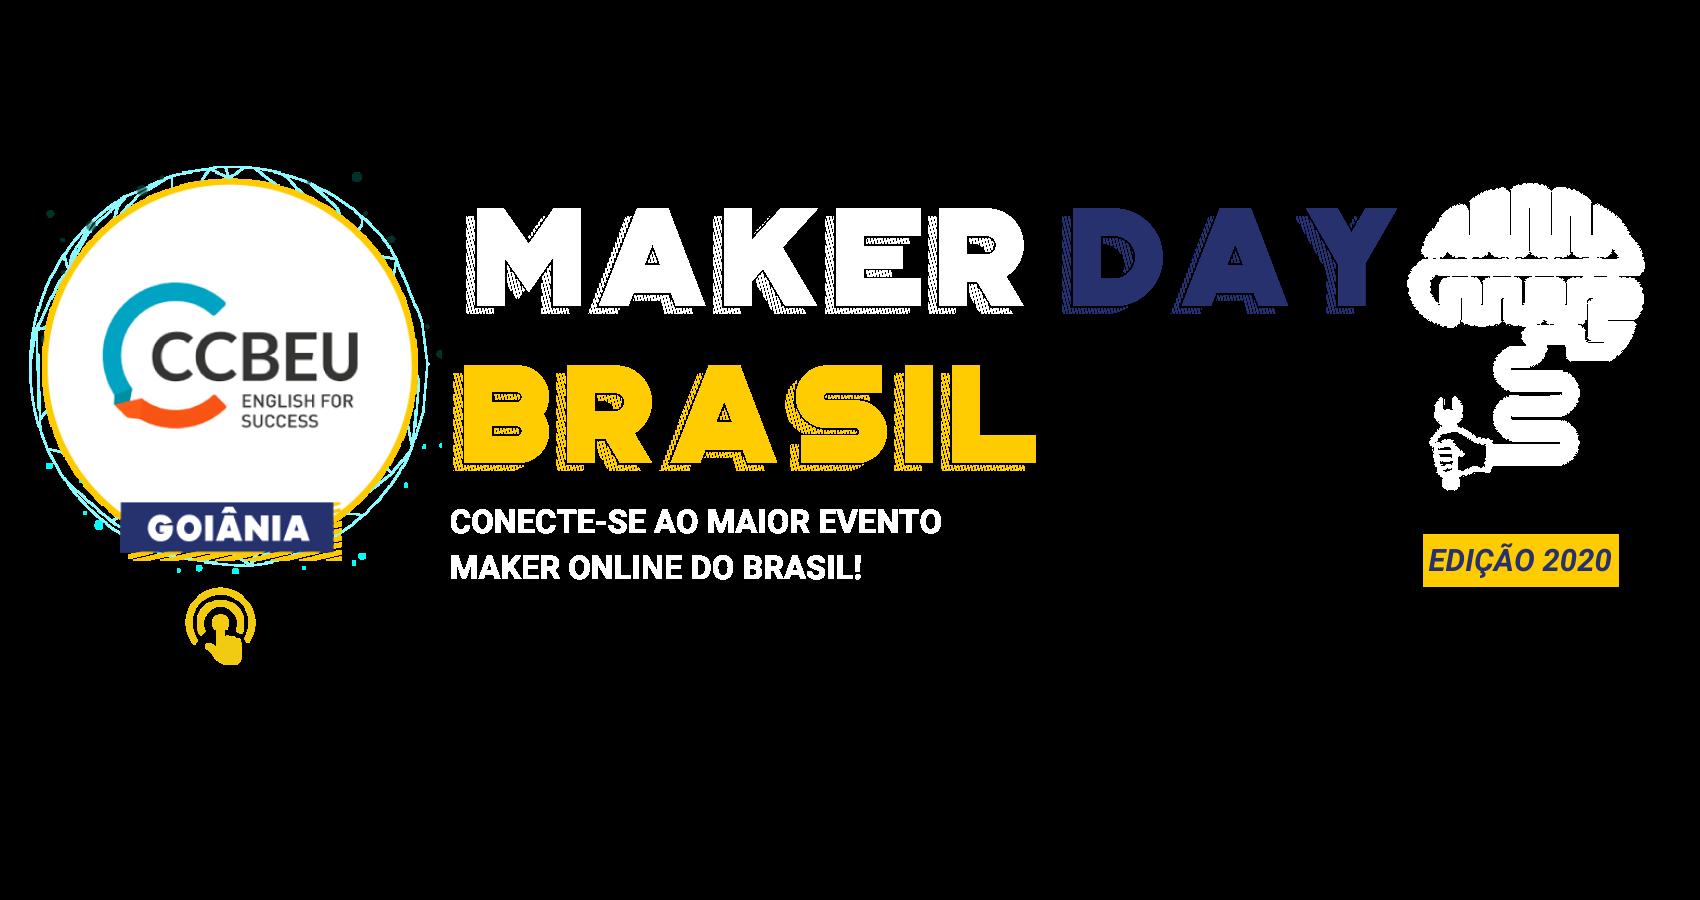 Maker Day Brasil Capa Goiania